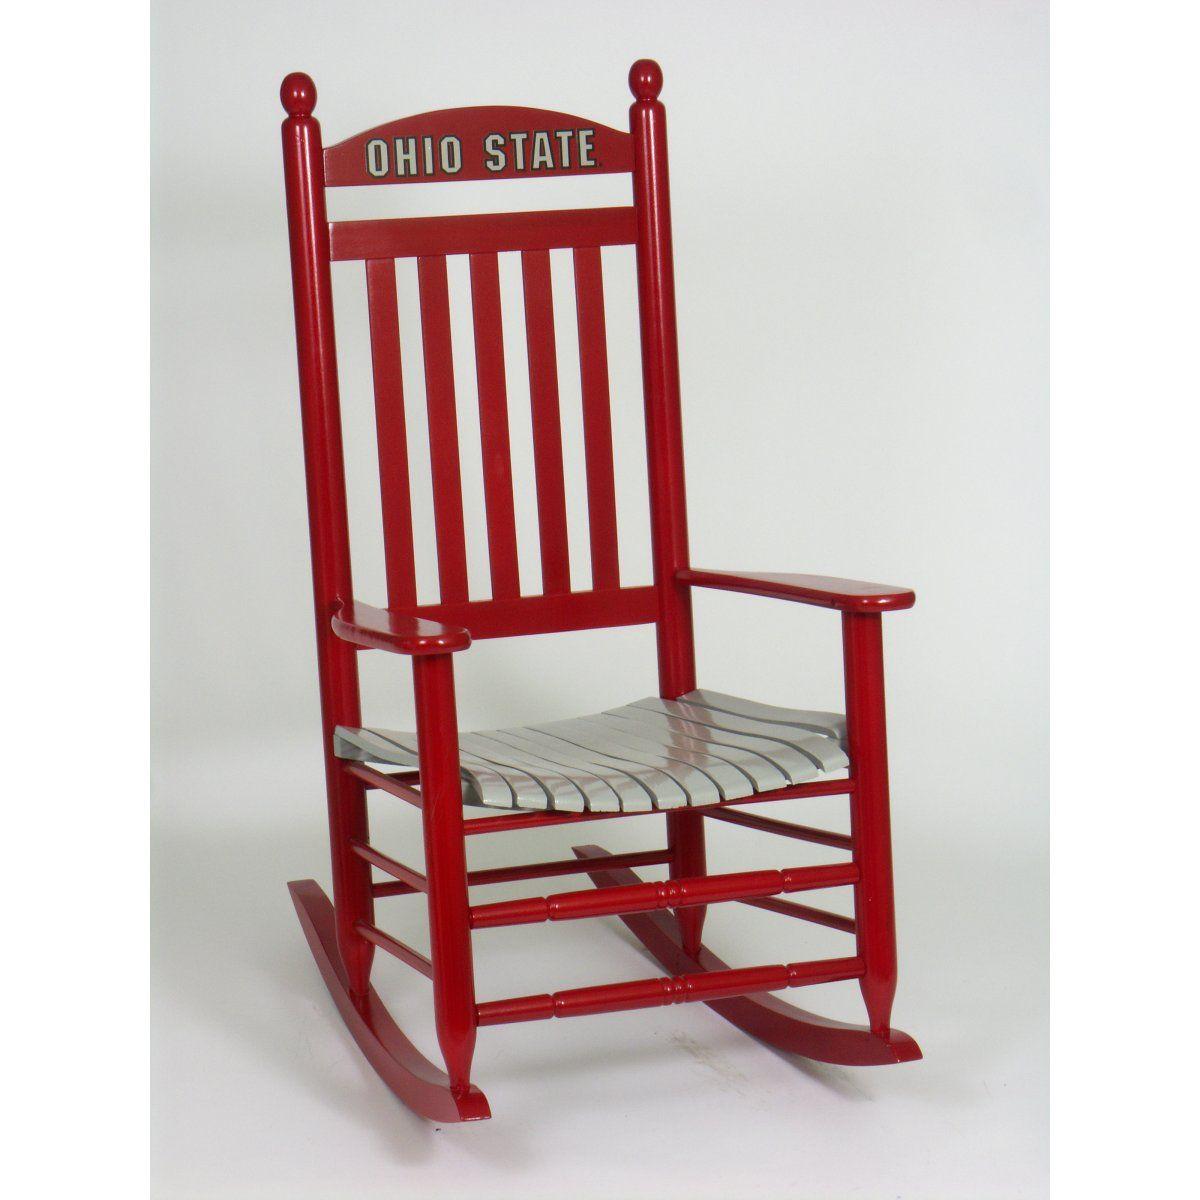 Ordinaire OHIO STATE ROCKING CHAIR   Indoor Rocking Chairs At Rocking Chairs